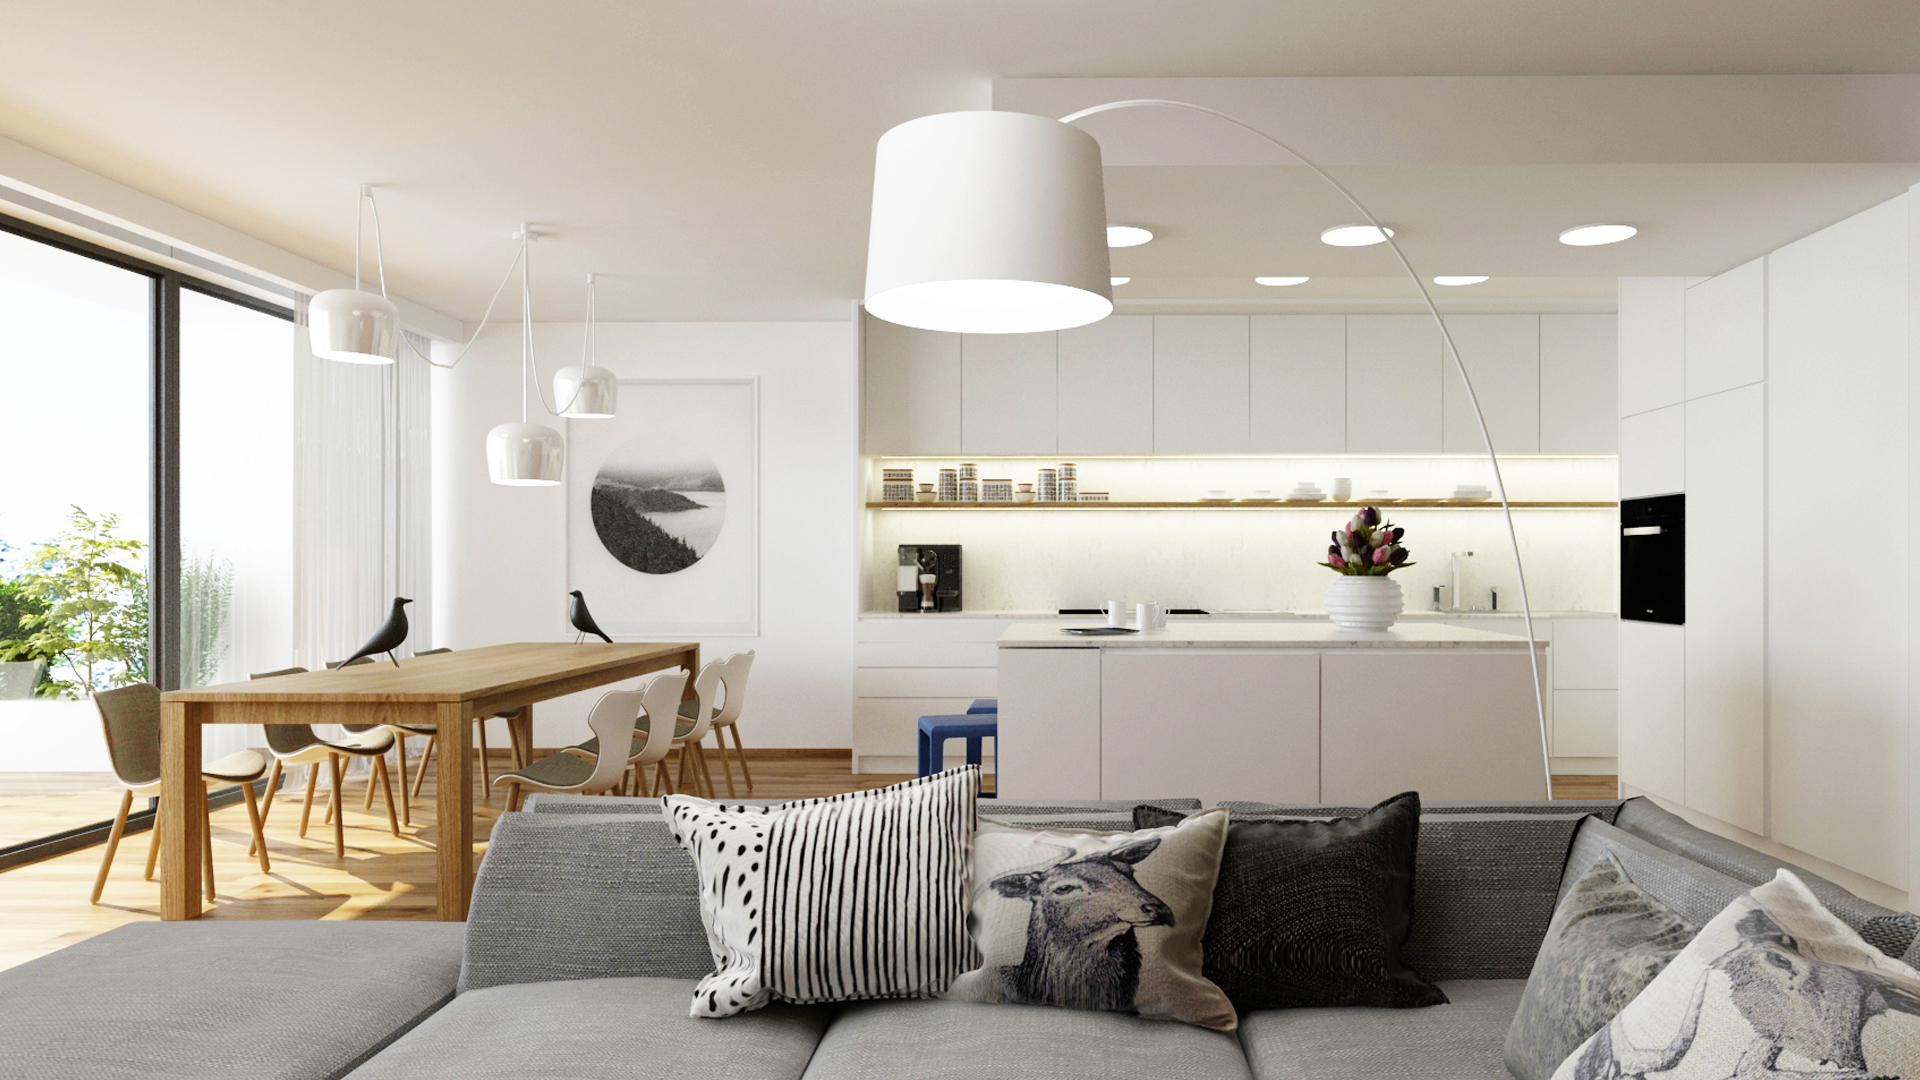 navrh bytu, interier bytu bratislava, navrh interieru bytu, navrh interieru jedalne, navrh interieru, navrh kuchyne, navrh interieru kuchyne, navrh jedalne, interierovy dizajn, interierovy dizajner, interior design, interior designer, veronika paluchova, flat design, deisgn bratislava, dub, prirodny dub, white flat, white kitchen, b&b chair, flos aim, flos light, foscarini light, vitra bird